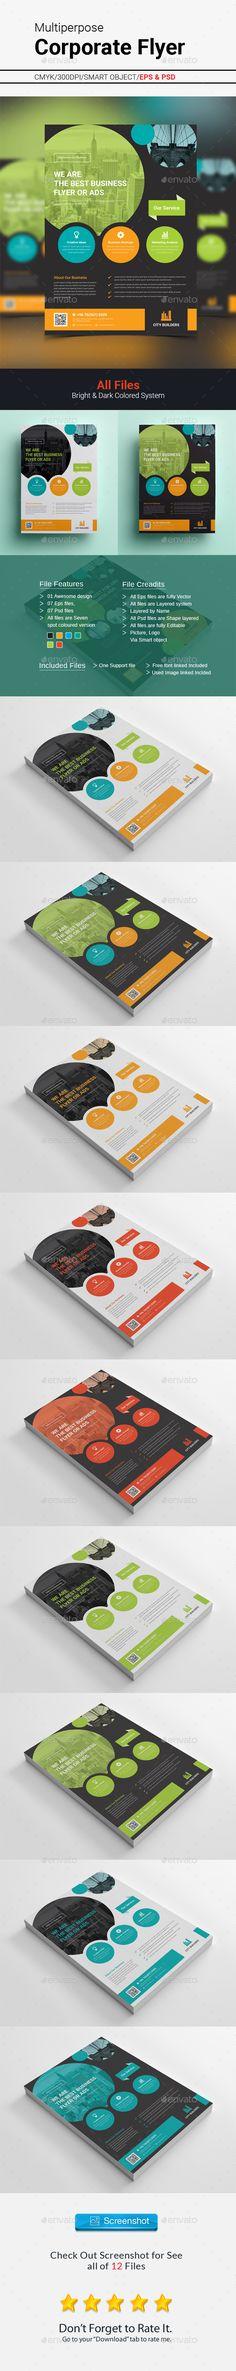 Corporate Flyer Template PSD #design Download: http://graphicriver.net/item/corporate-flyer/14398981?ref=ksioks